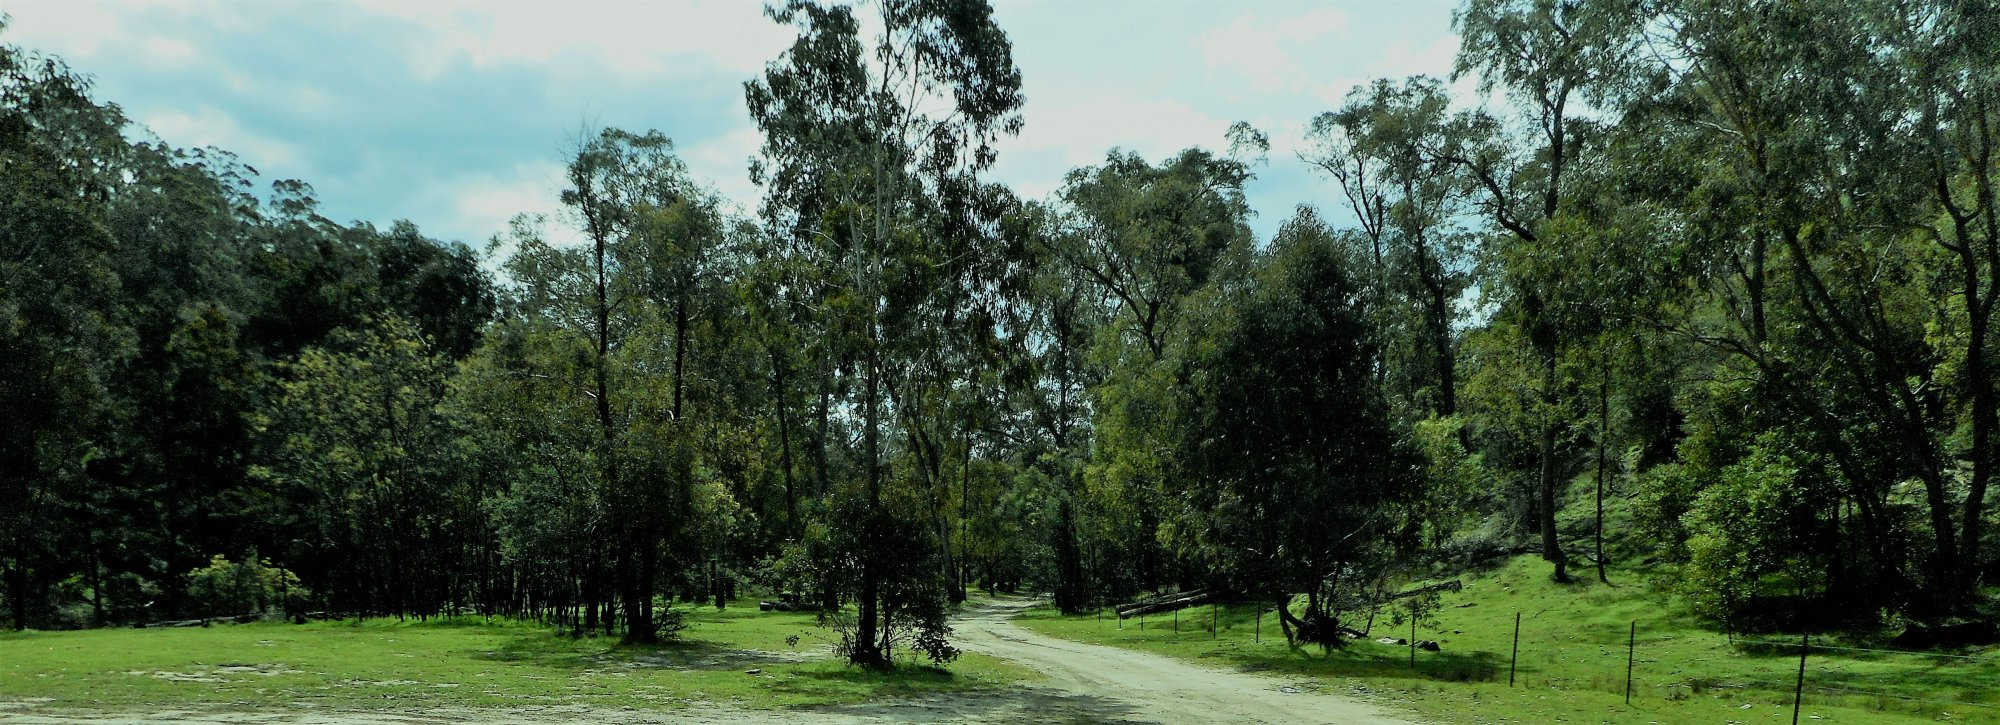 McIntyres grass.JPG